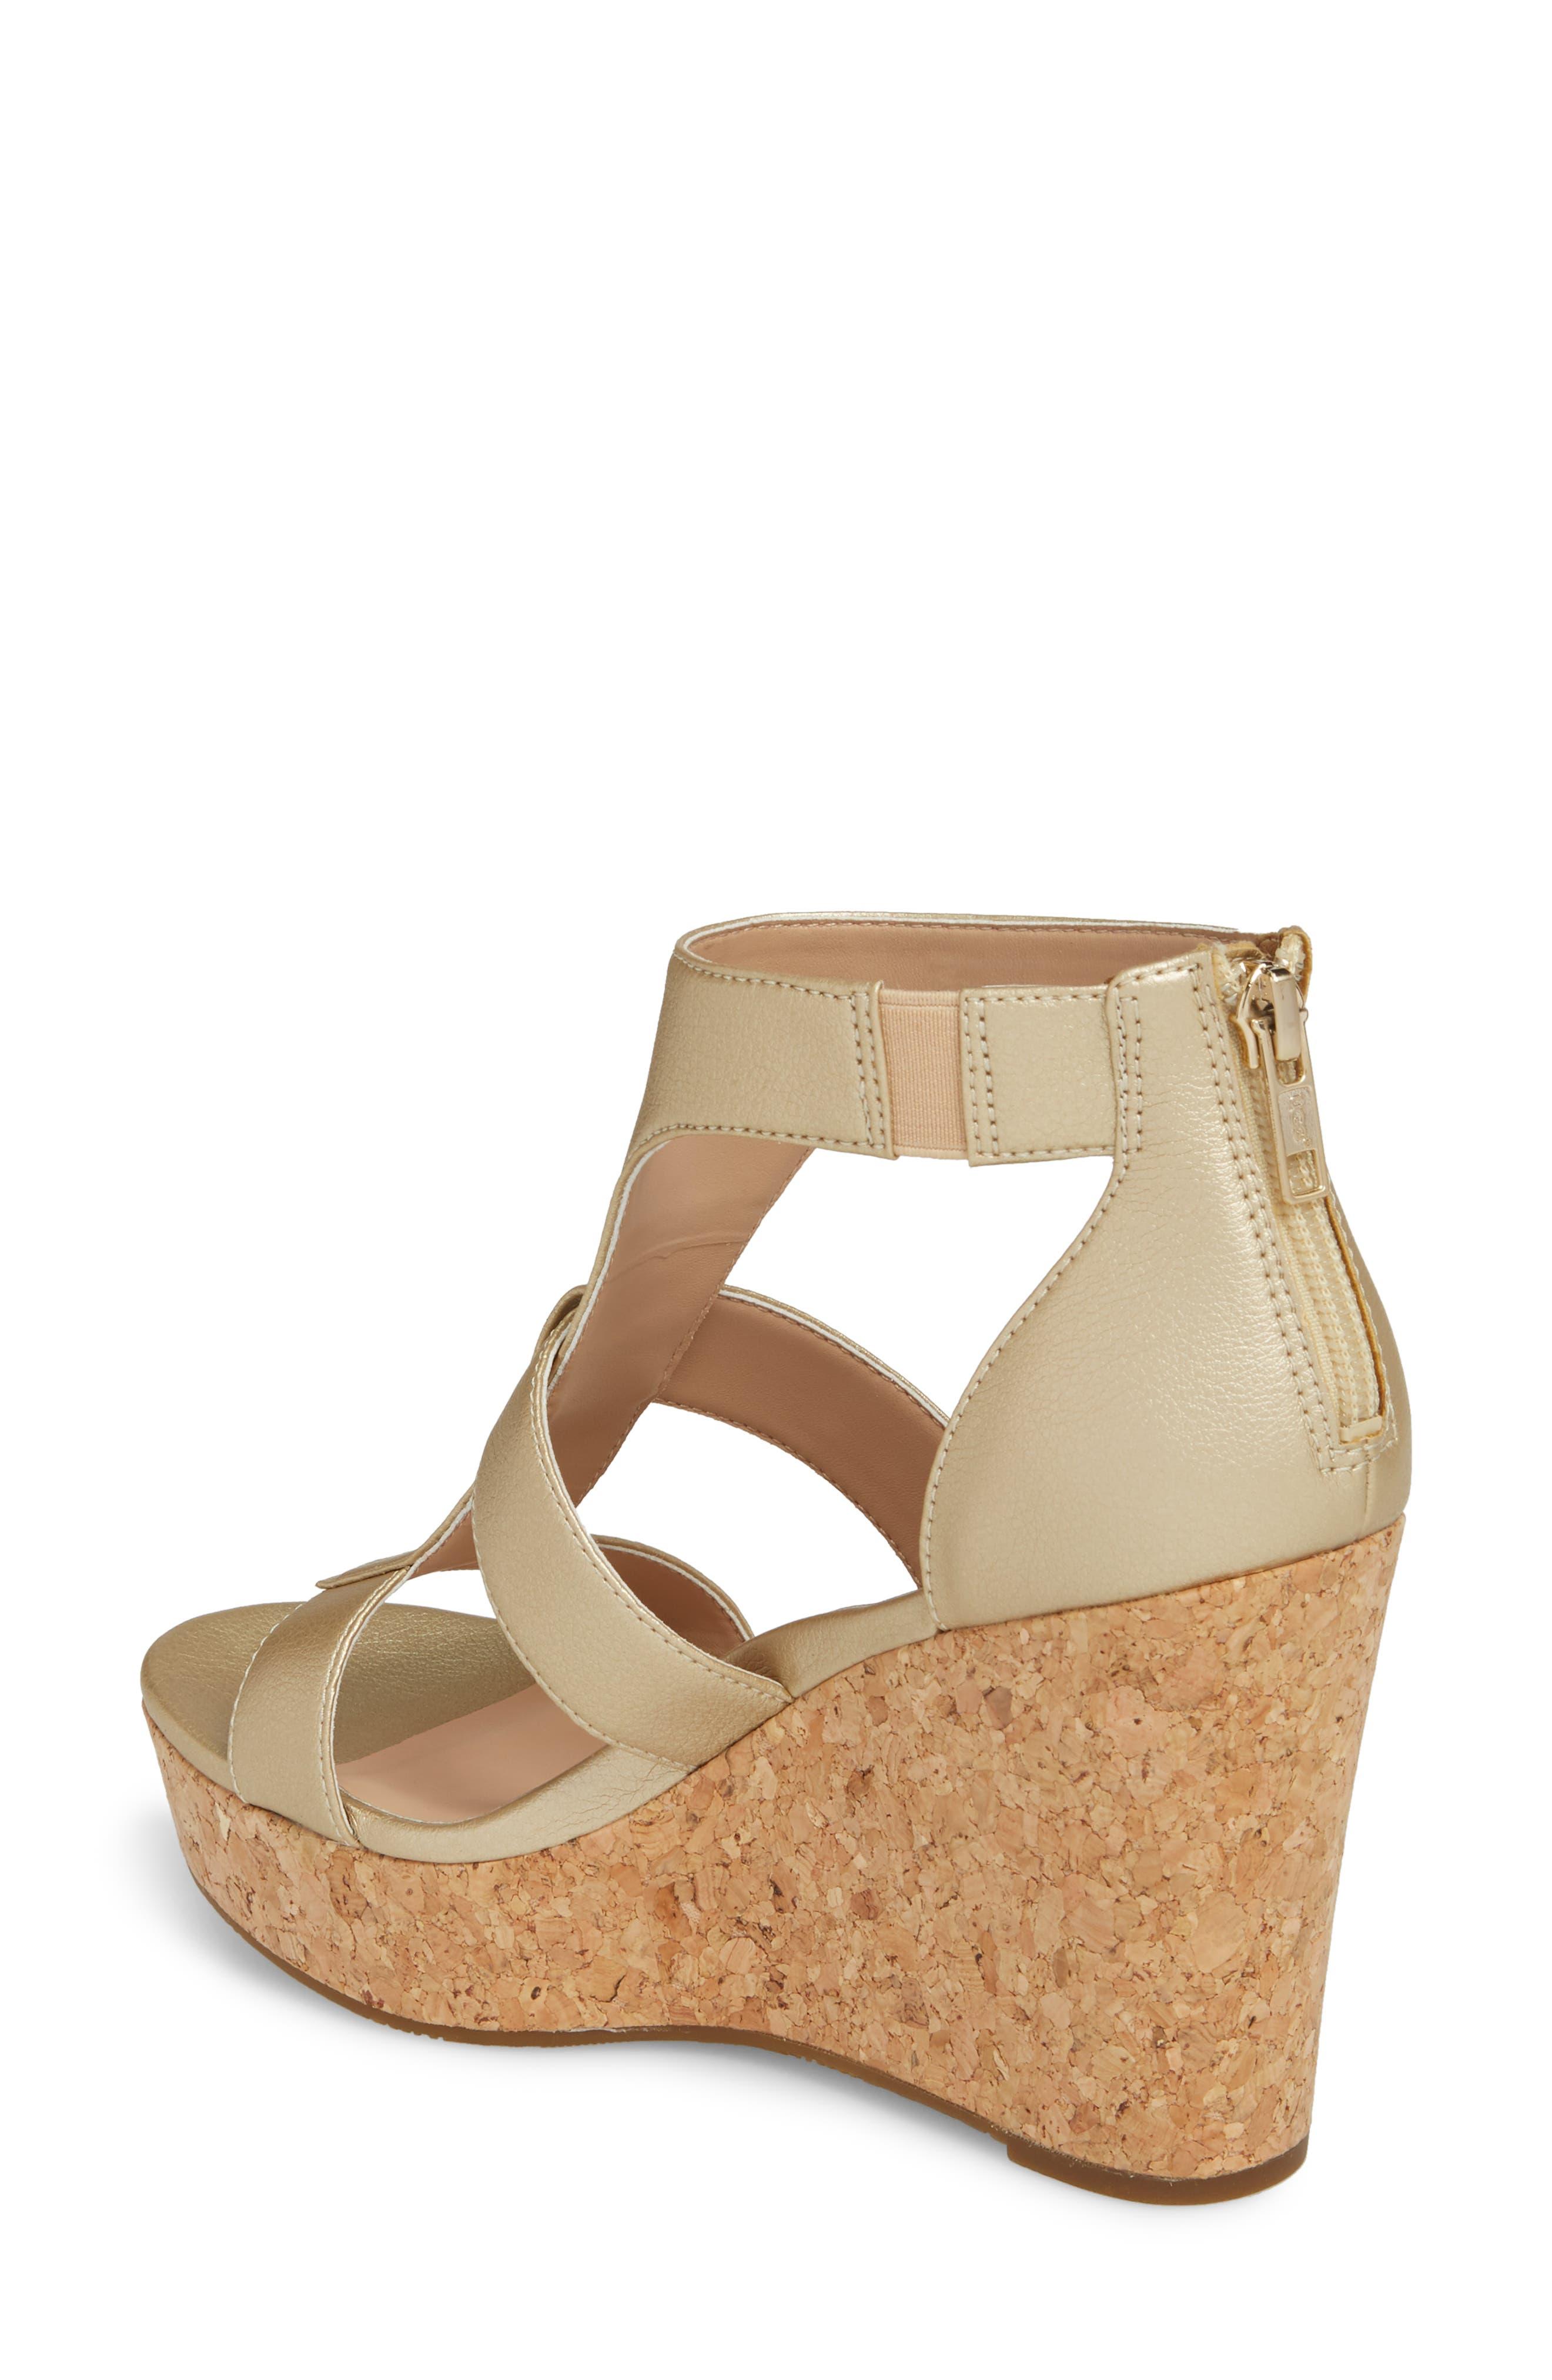 Whitney Platform Wedge Sandal,                             Alternate thumbnail 2, color,                             Gold Leather